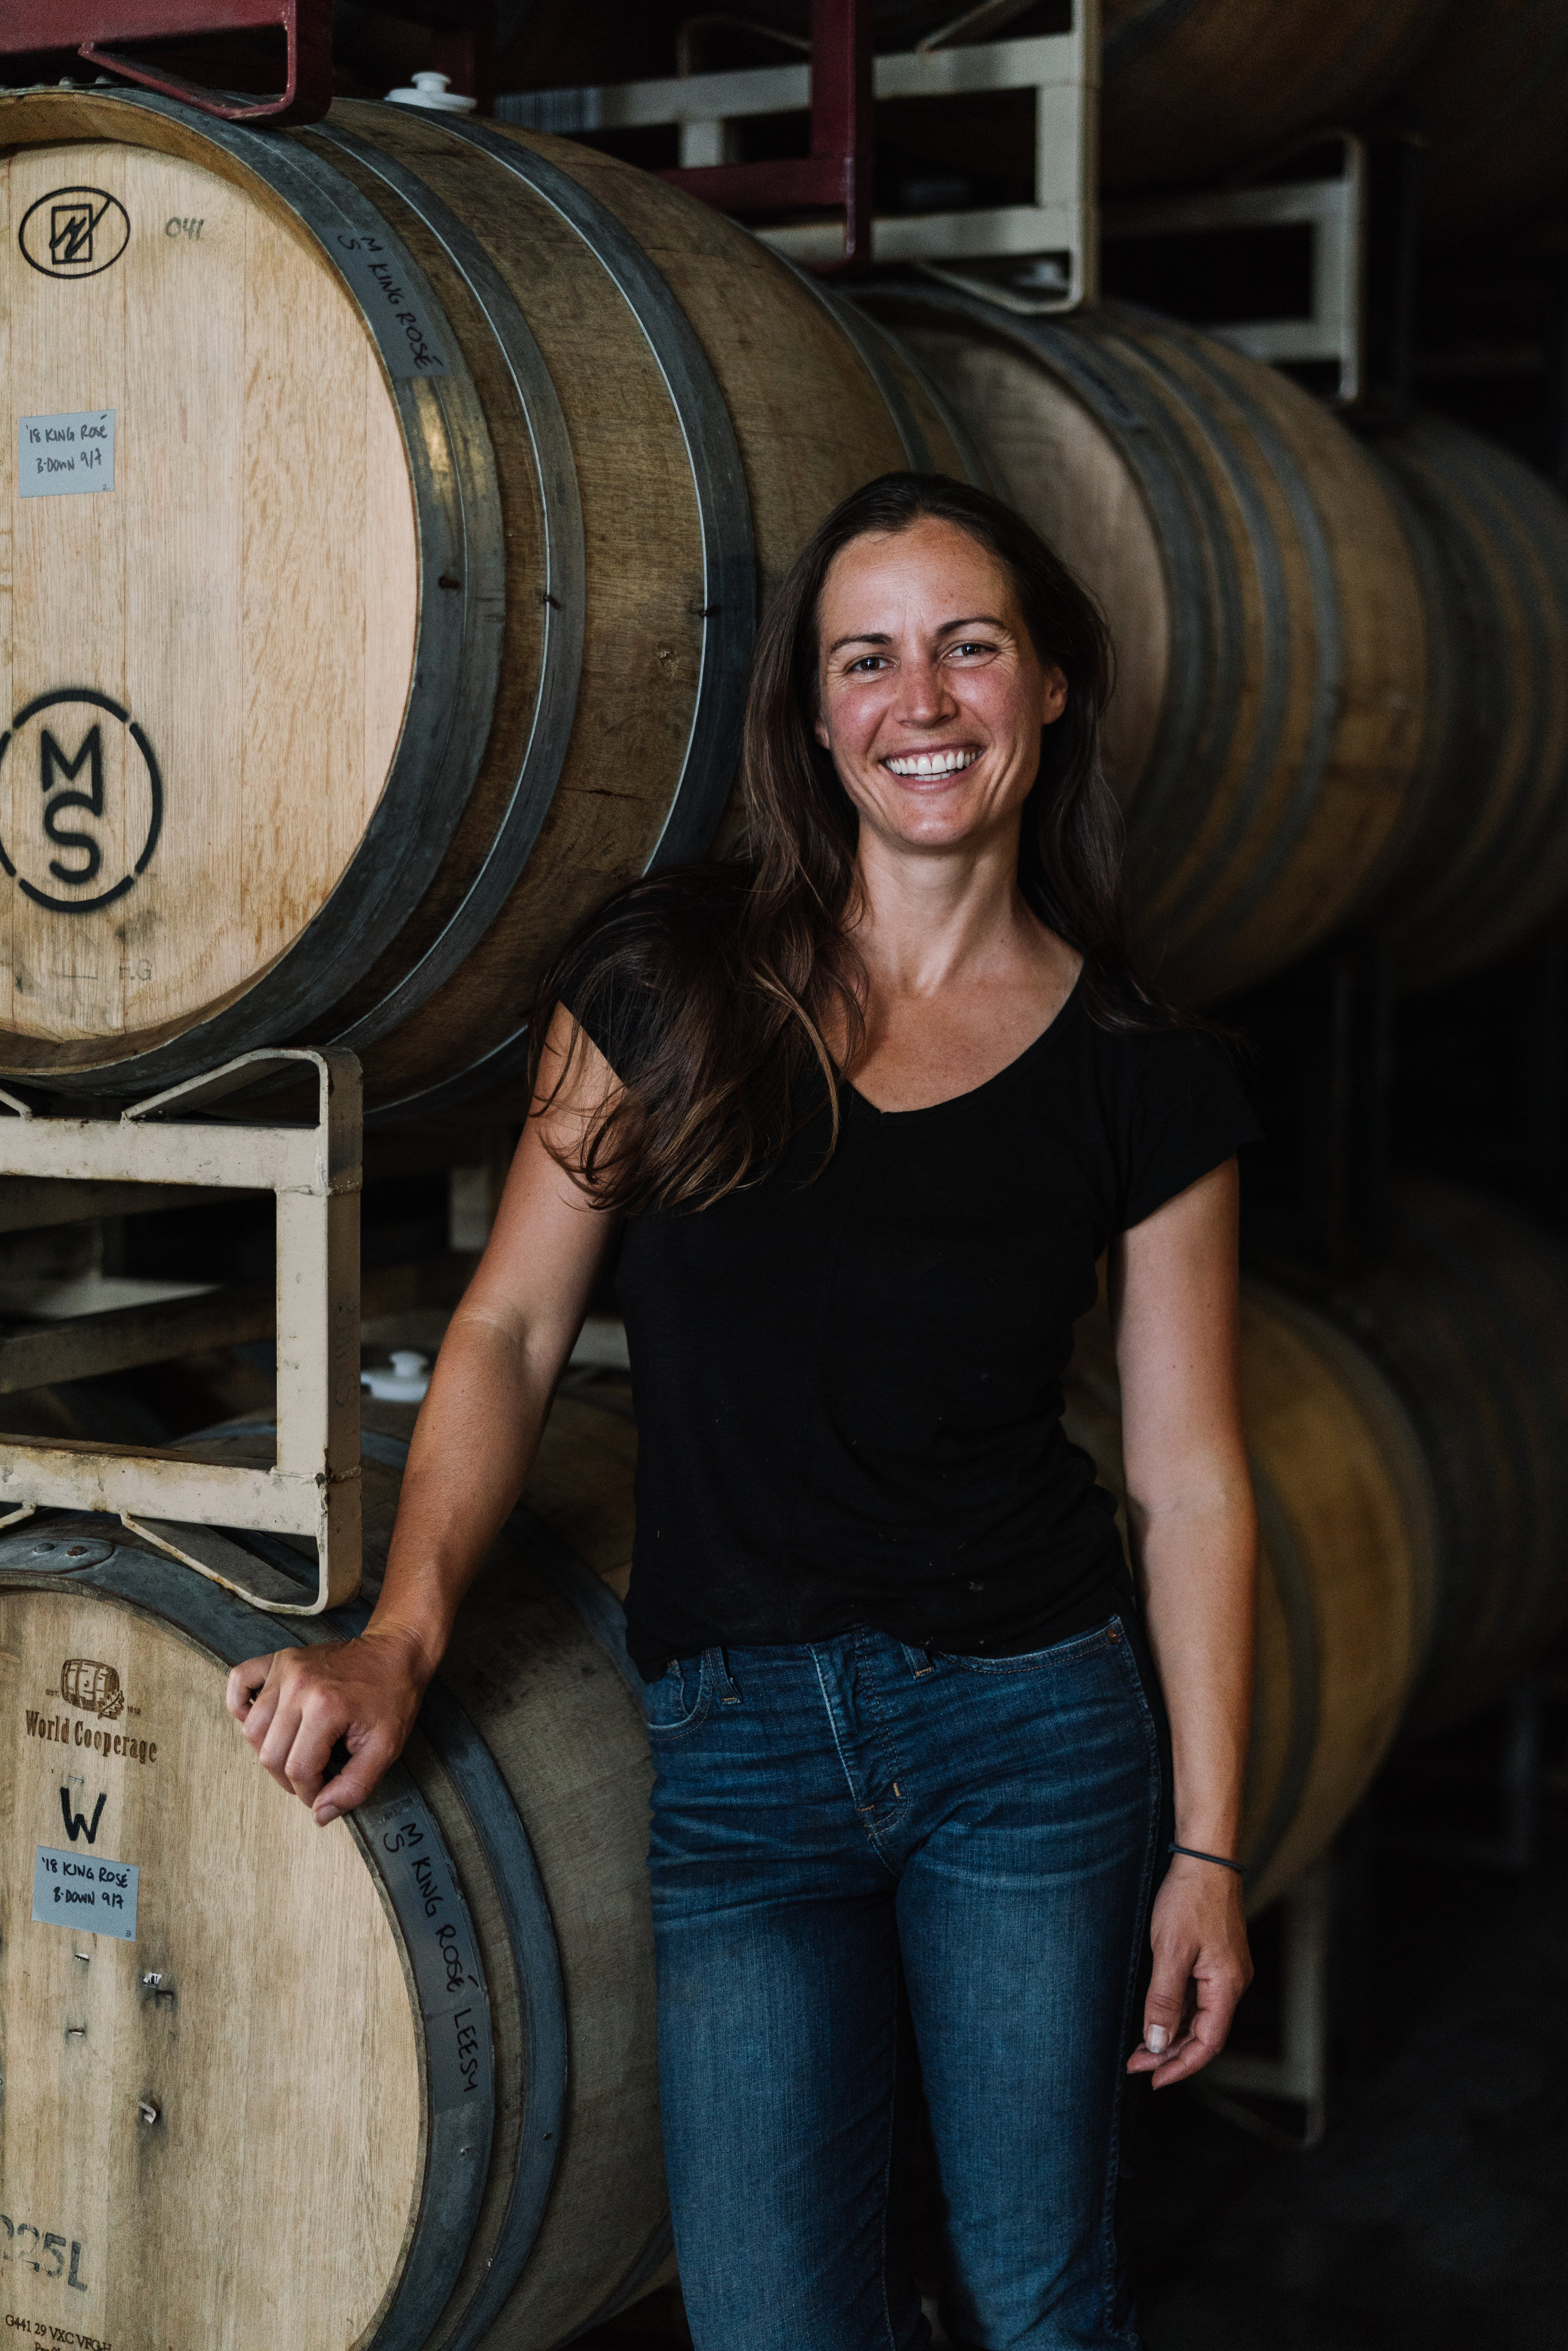 MARTHA STOUMEN, 7.12.19 - Martha Stoumen is an inspirational winemaker based in Sebastopol, California. She focuses on producing natural wines from unique grapes like Nero d'Avola.